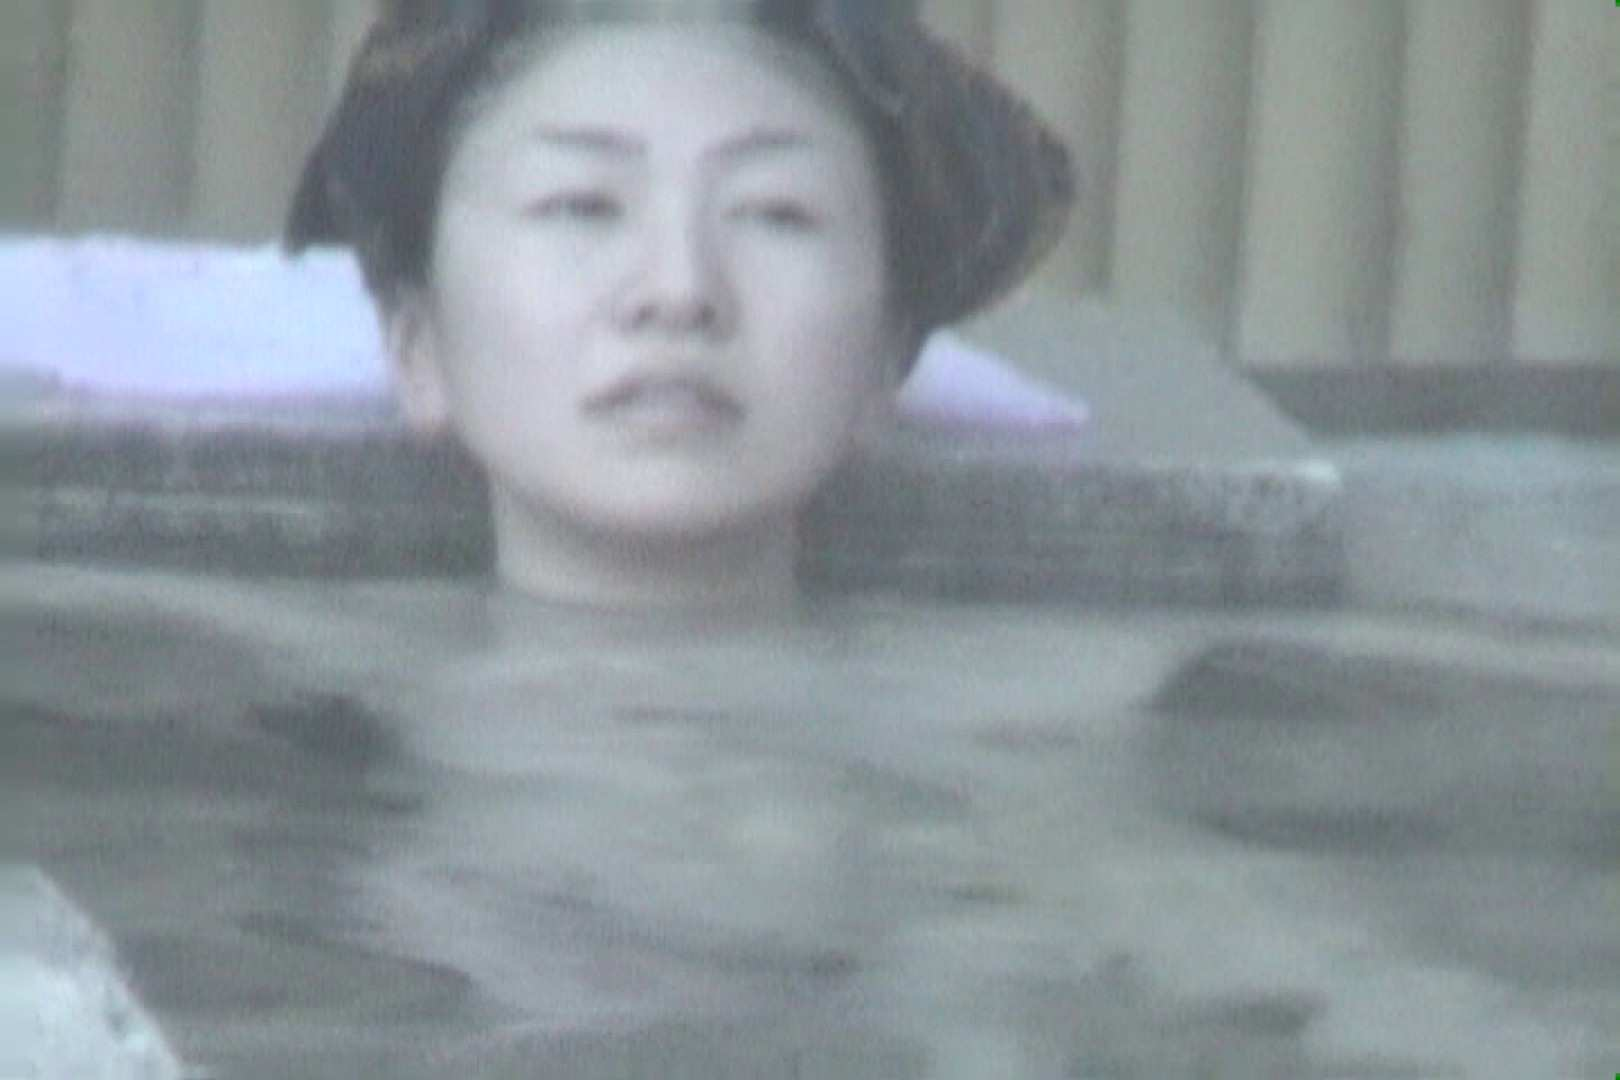 Aquaな露天風呂Vol.607 OLエロ画像 覗きオメコ動画キャプチャ 69PICs 62